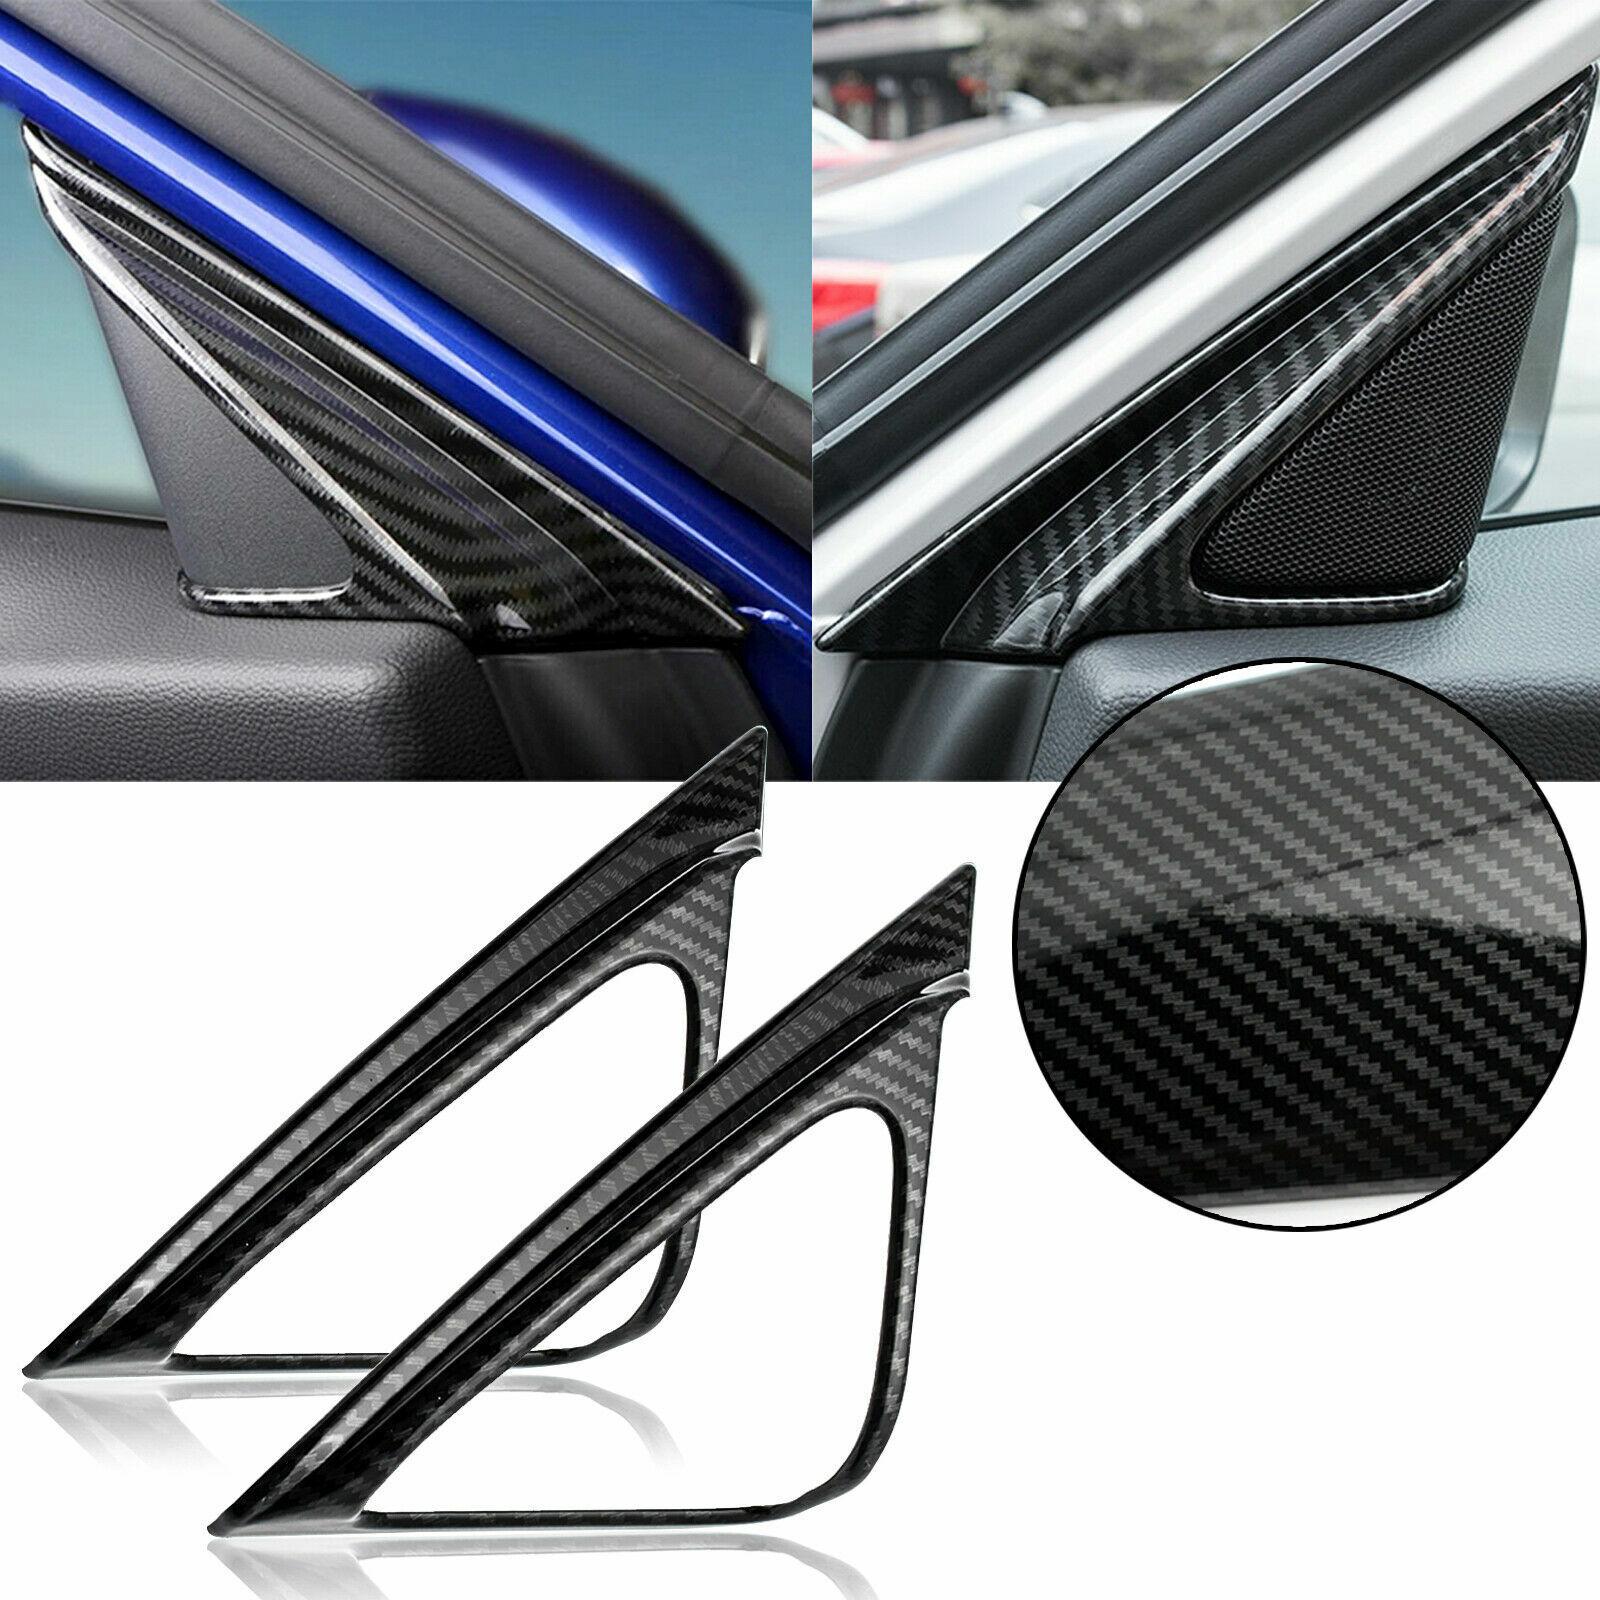 Carbon Fiber Look Dashboard Decorative Panel Cover Trim For 2016-18 Toyota RAV4